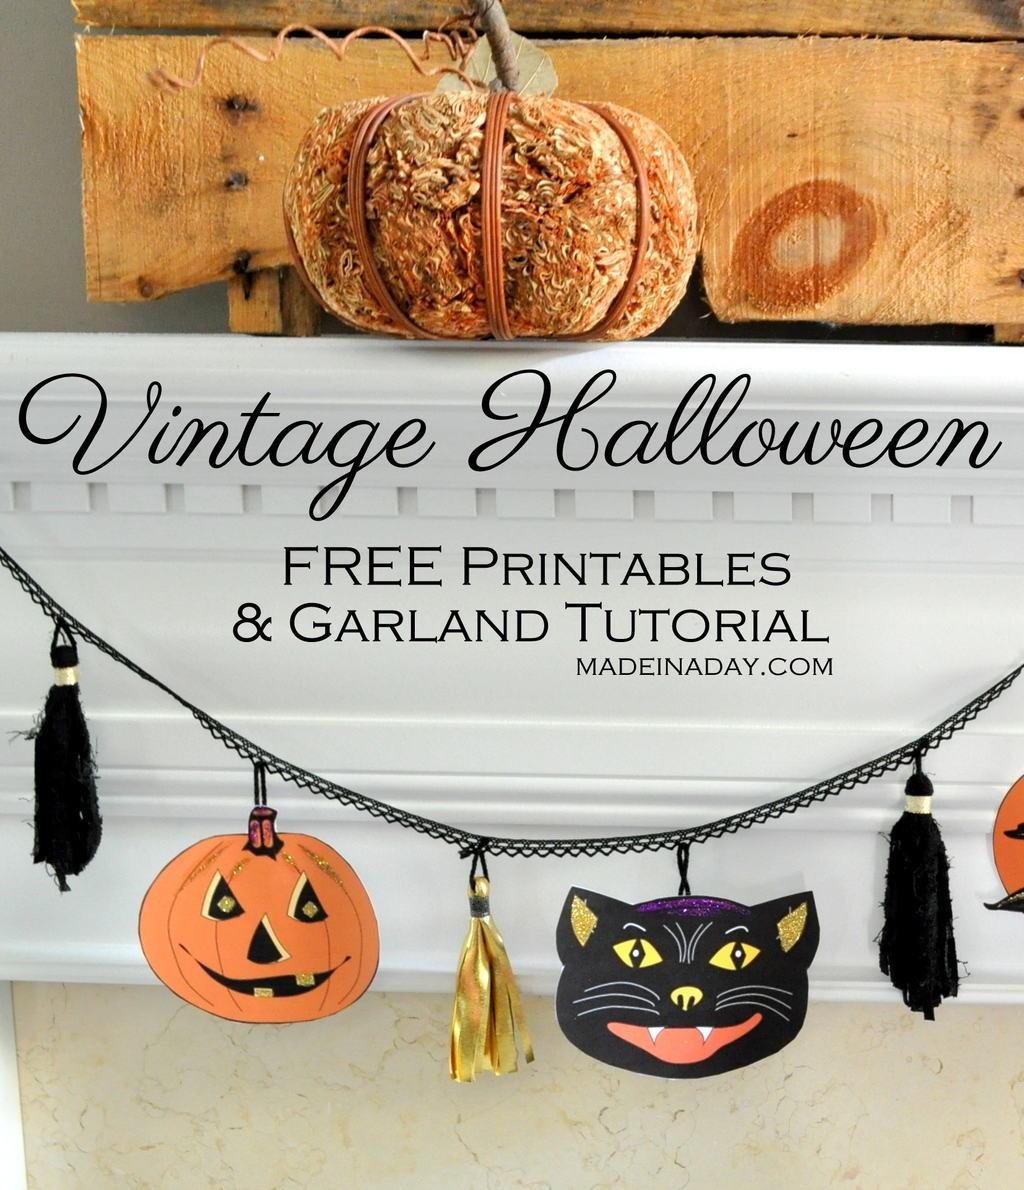 Vintage Halloween Printable Garland - Free Vintage Halloween Printables